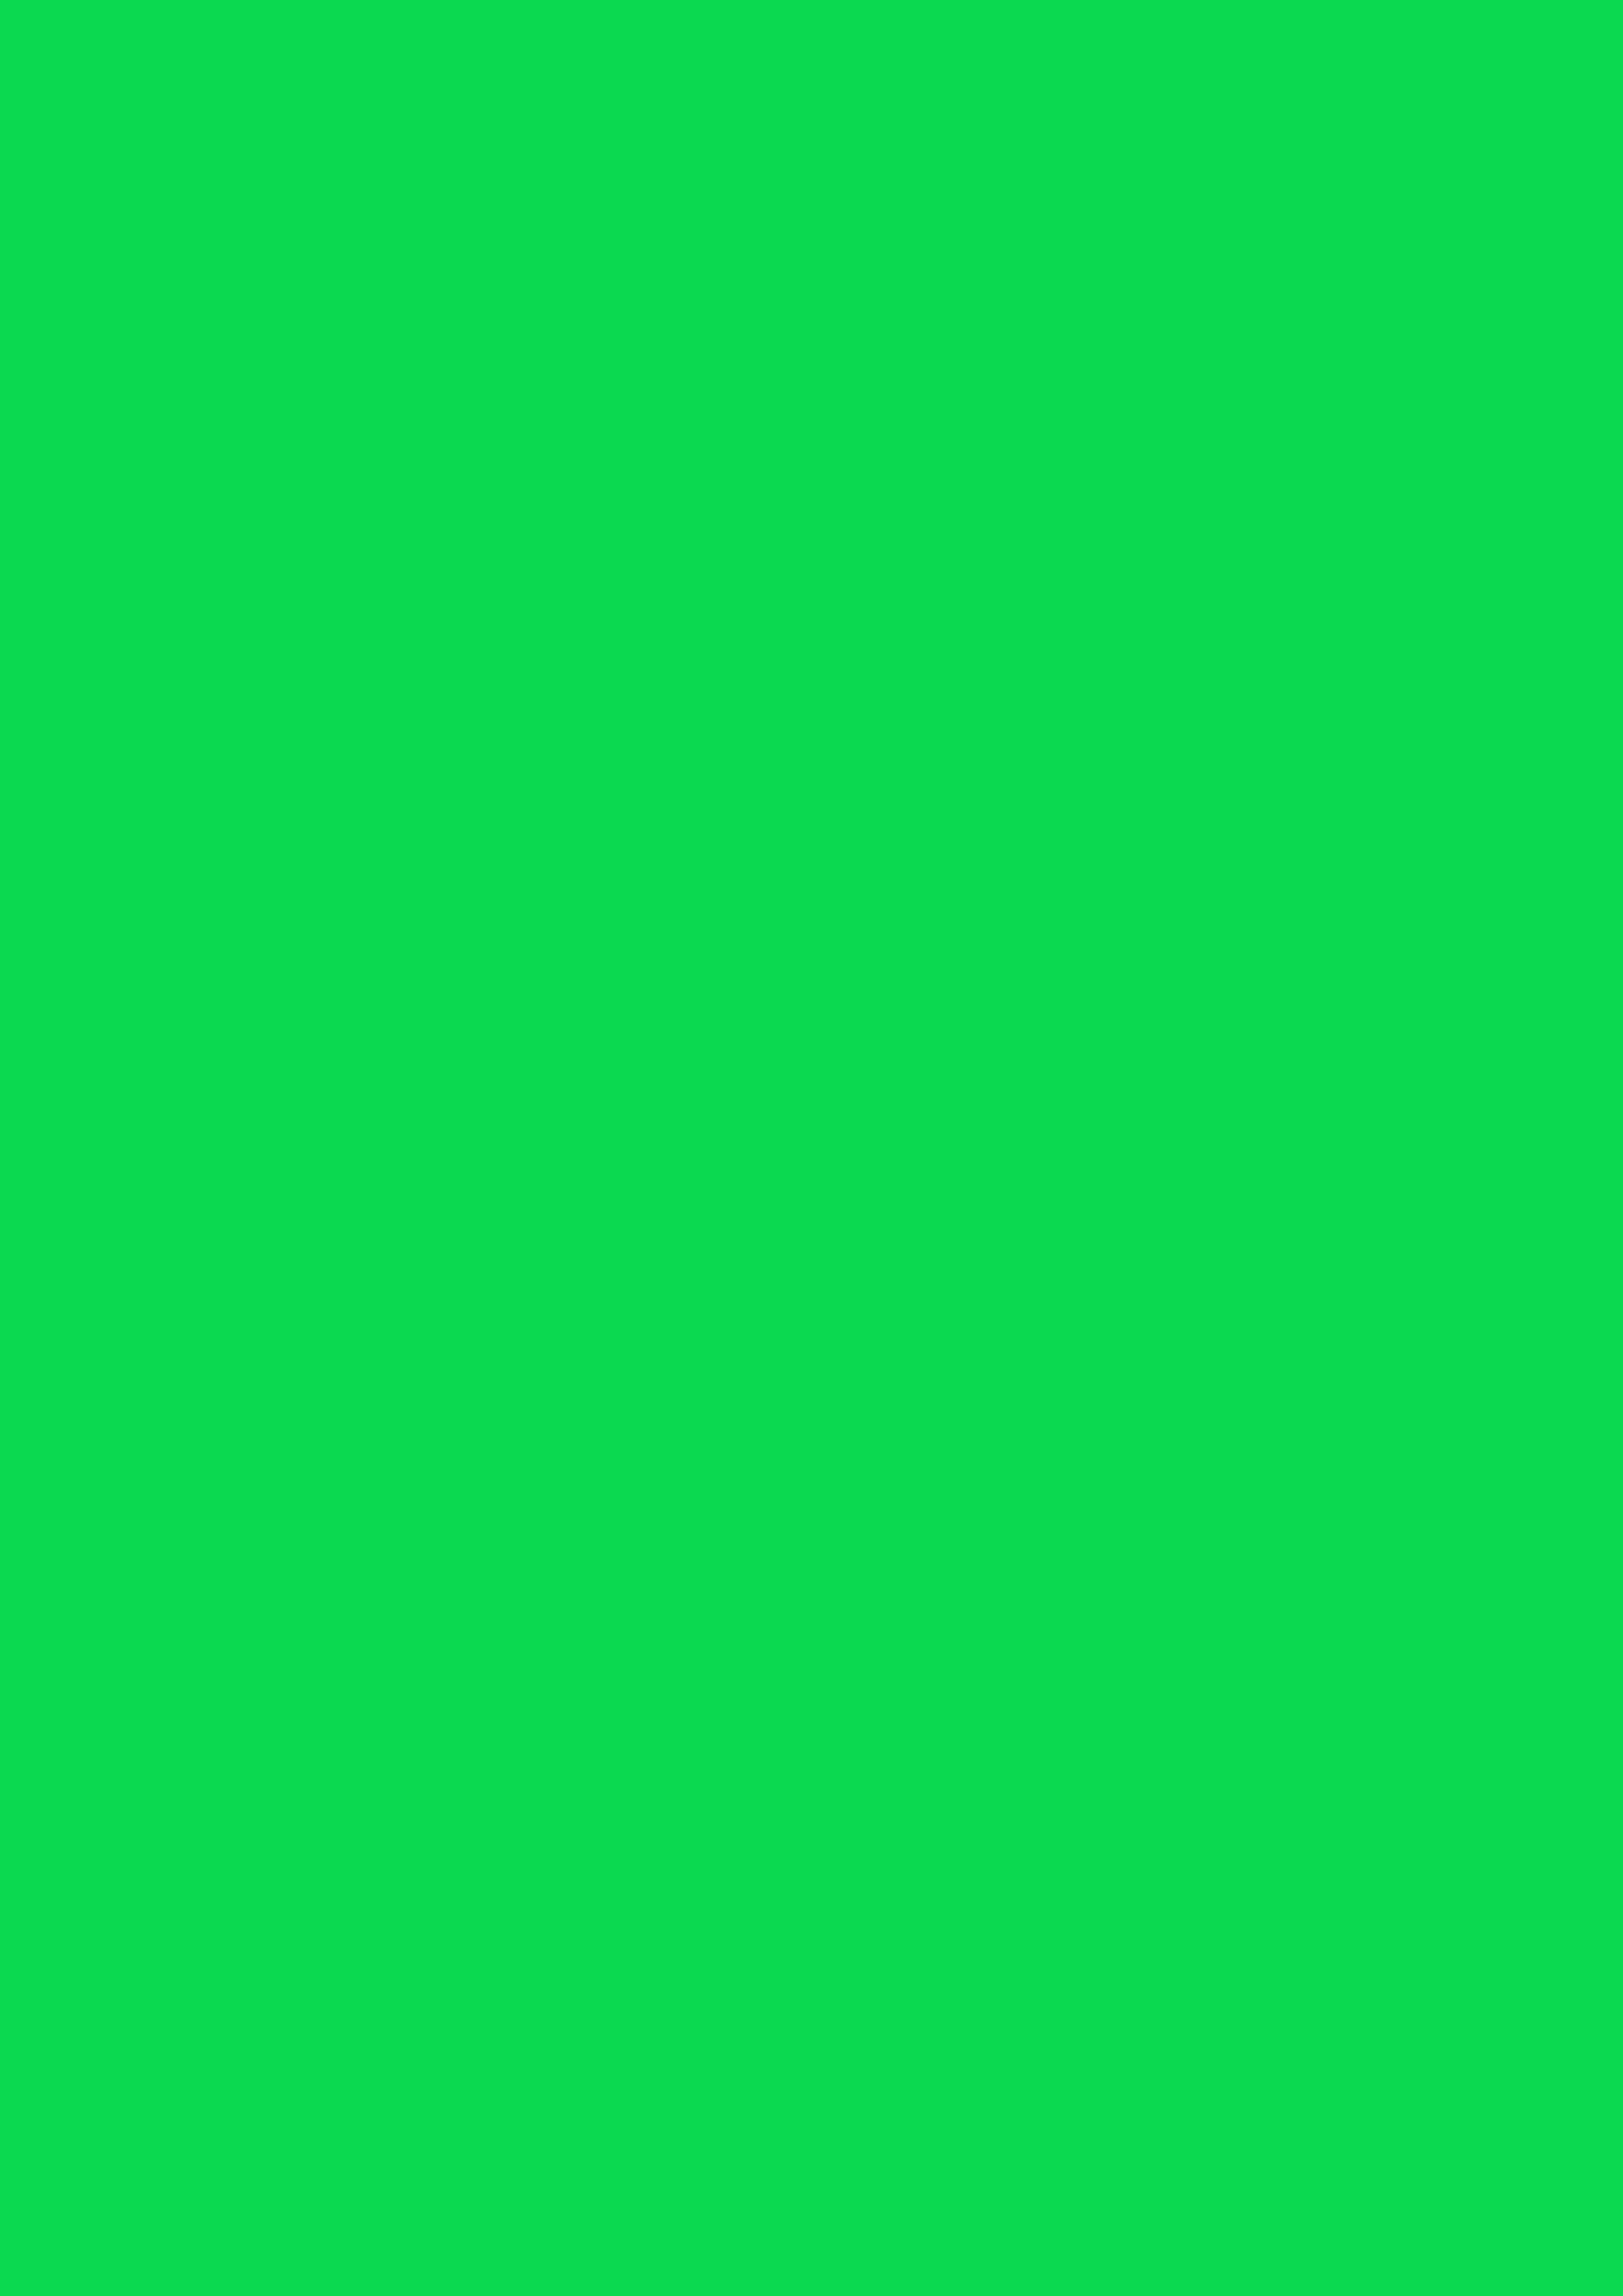 2480x3508 Malachite Solid Color Background